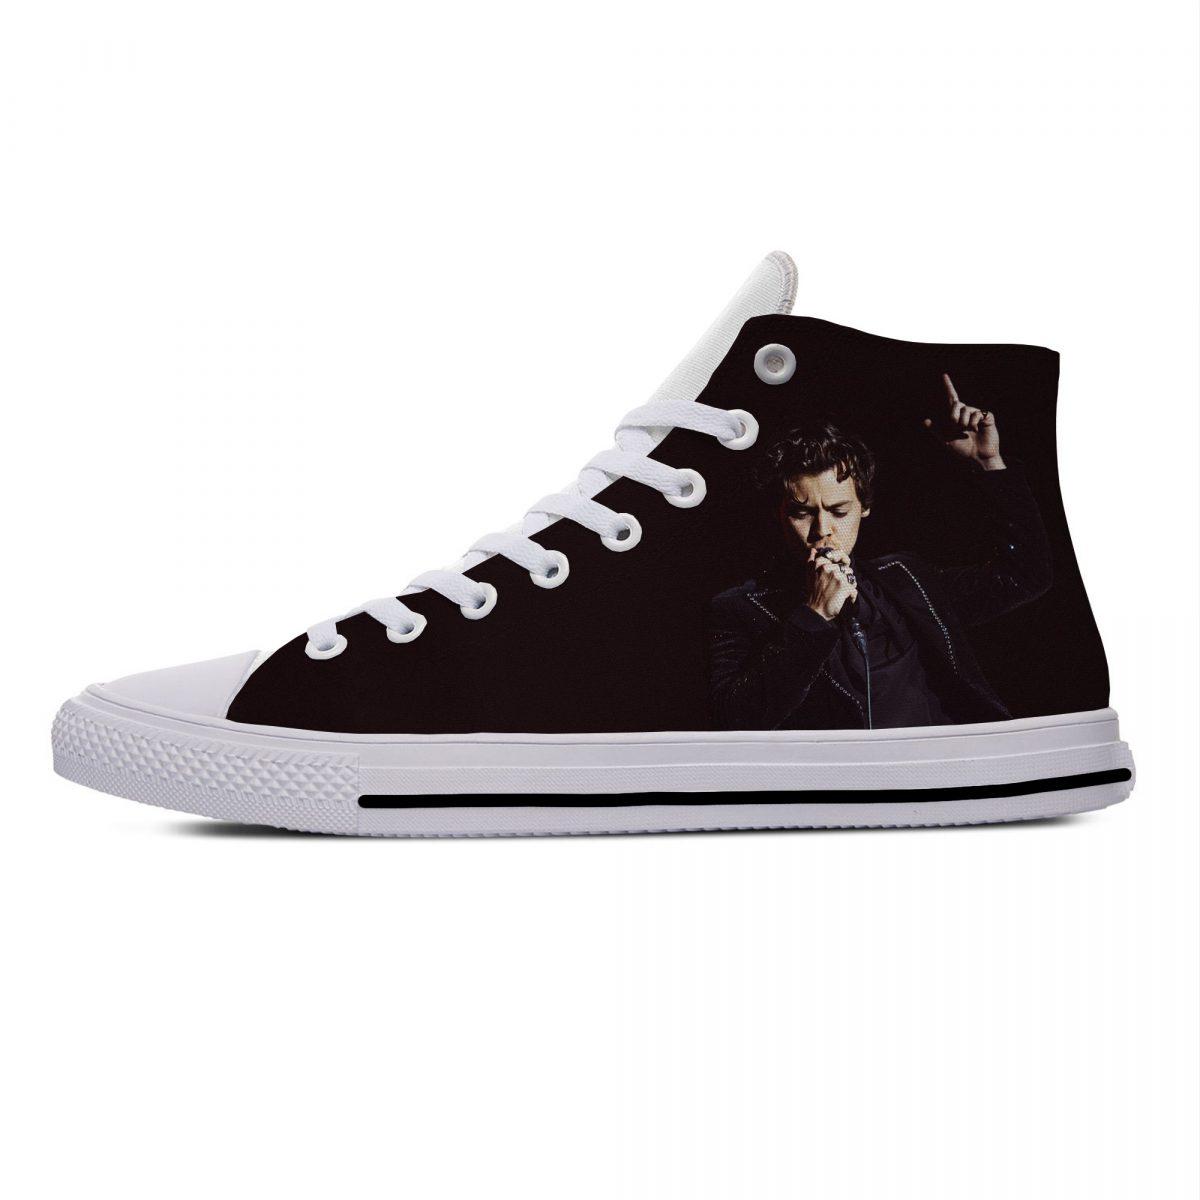 Harry Styles Pop Singer Shoes